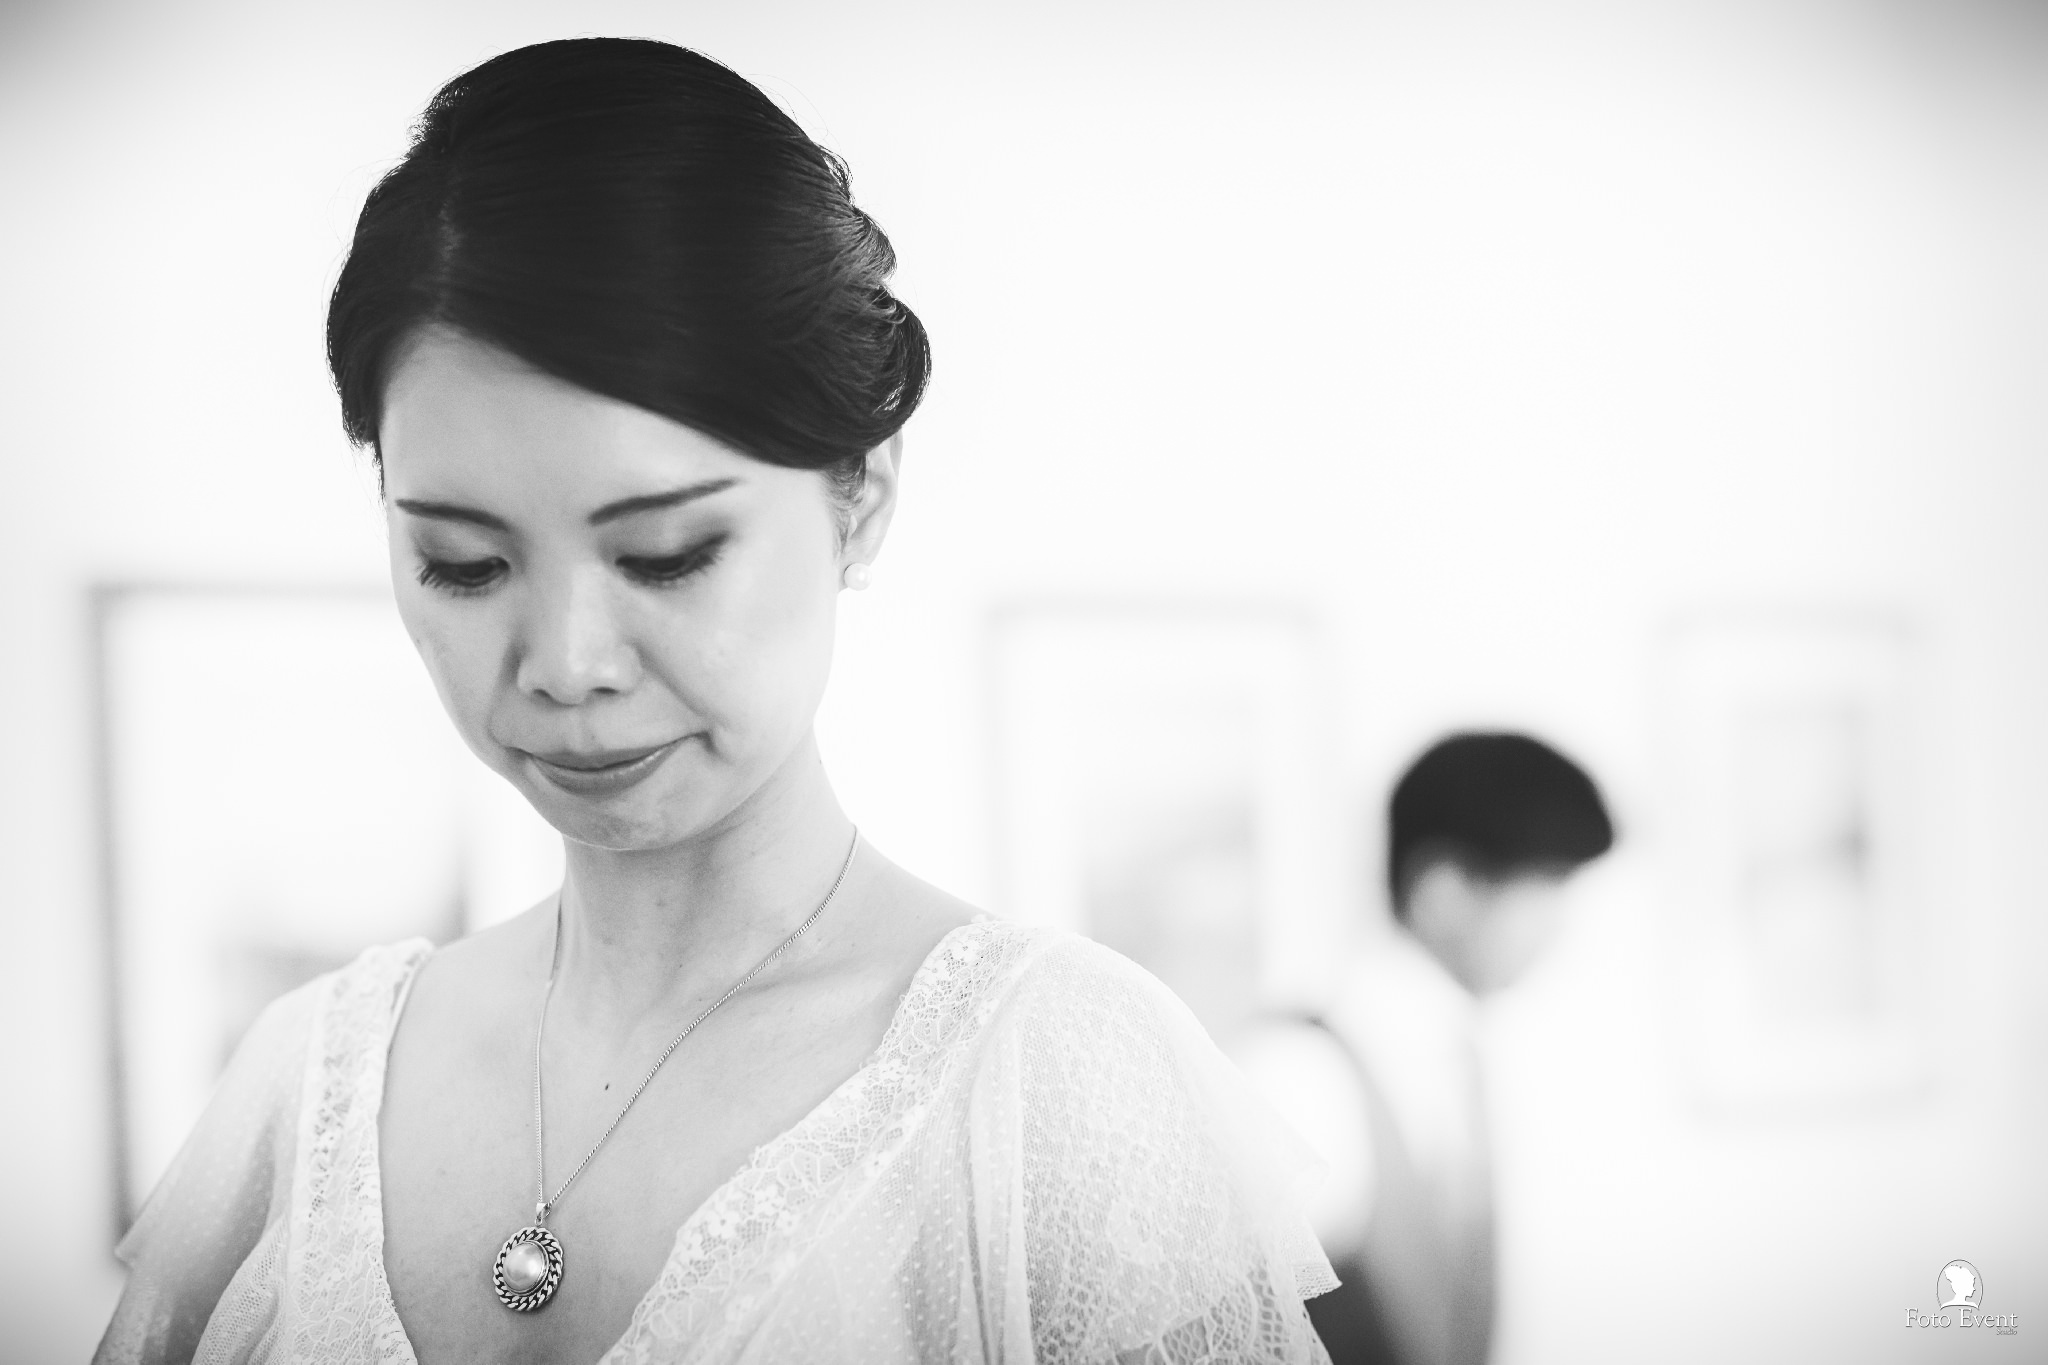 094-2019-06-14-Wedding-Yume-e-Makoto-Isee-80mm-043-Edit